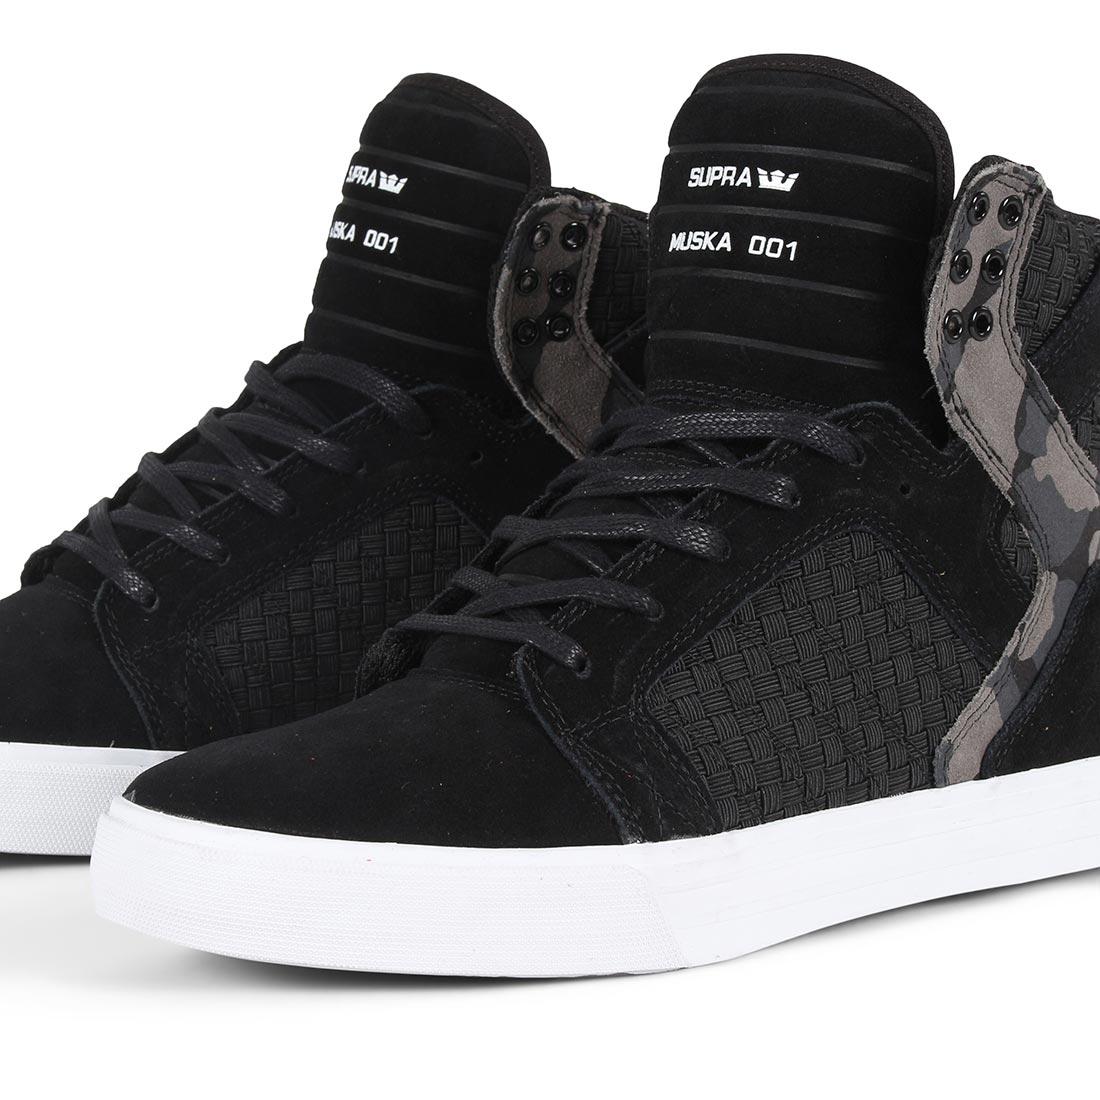 Supra Skytop Shoes - Black / Camo / White